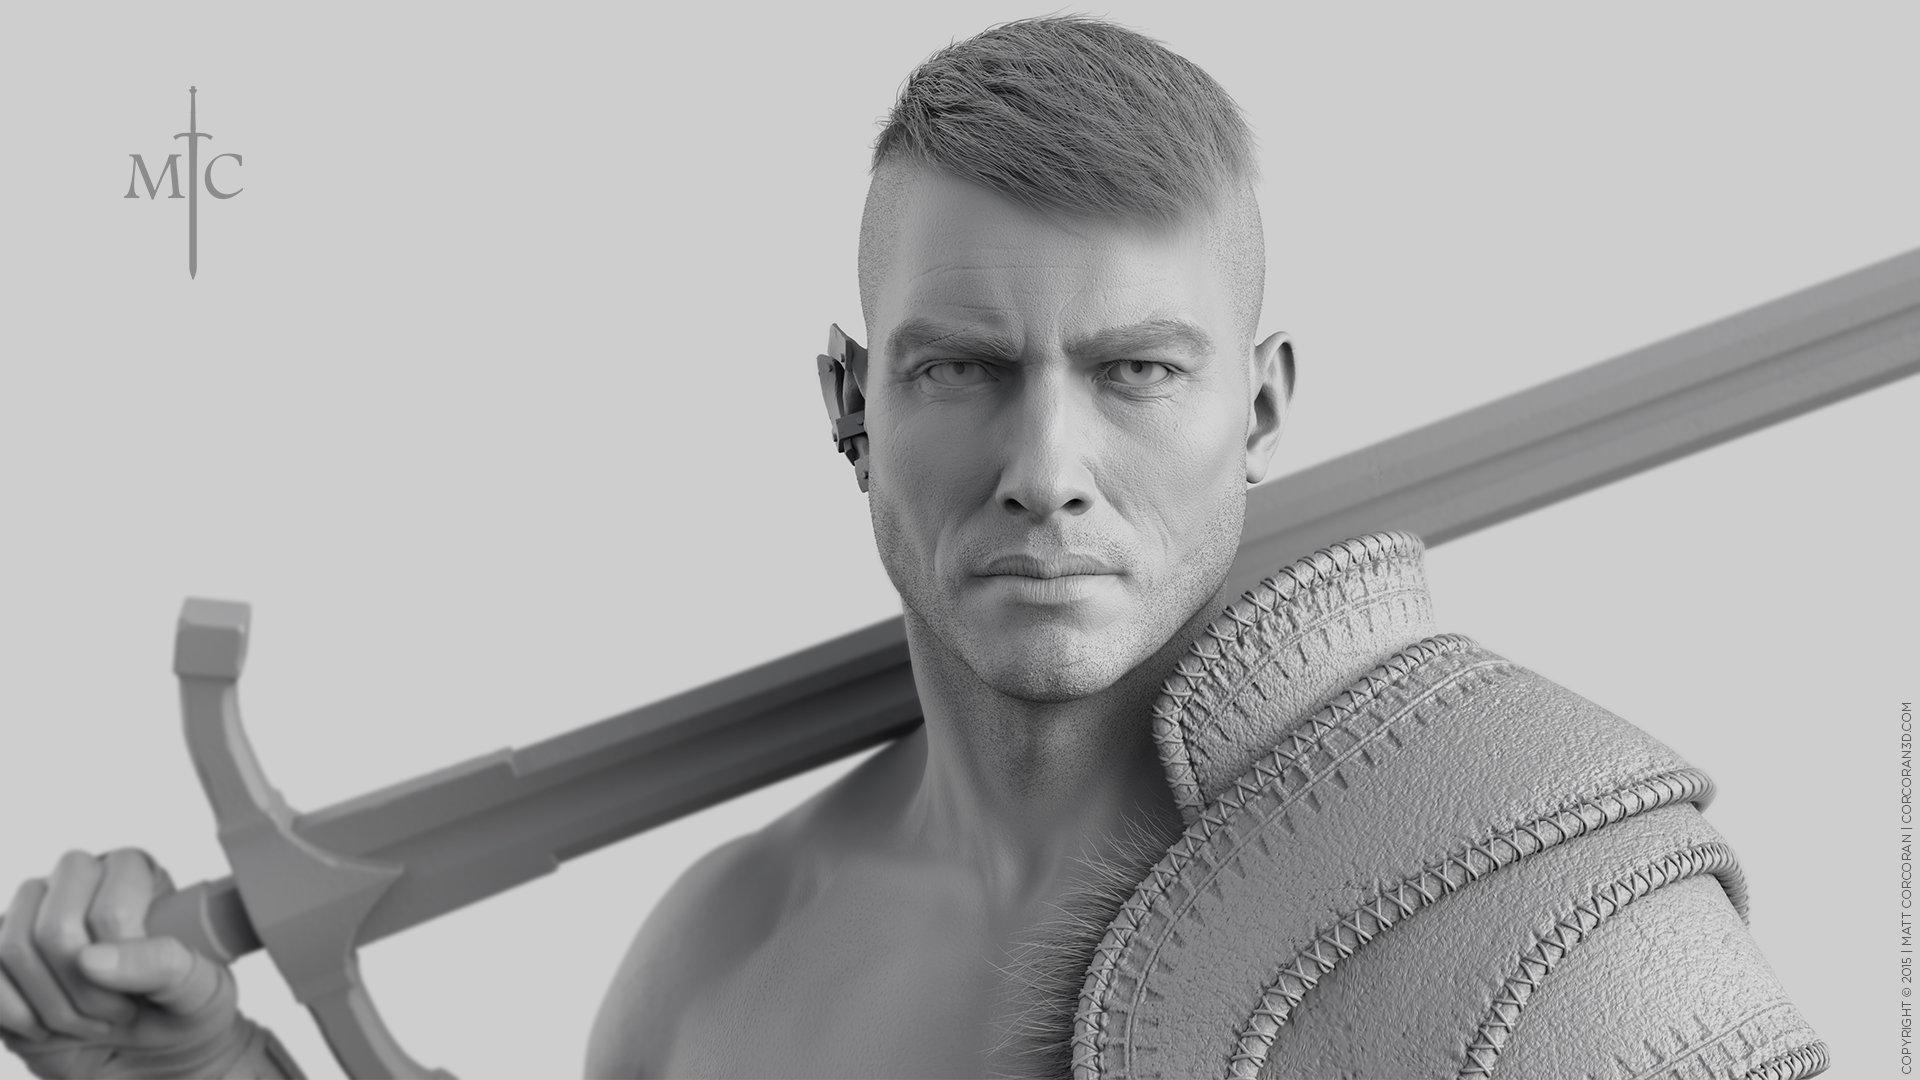 Matt corcoran mattcorcoran warrior grey 1k 02